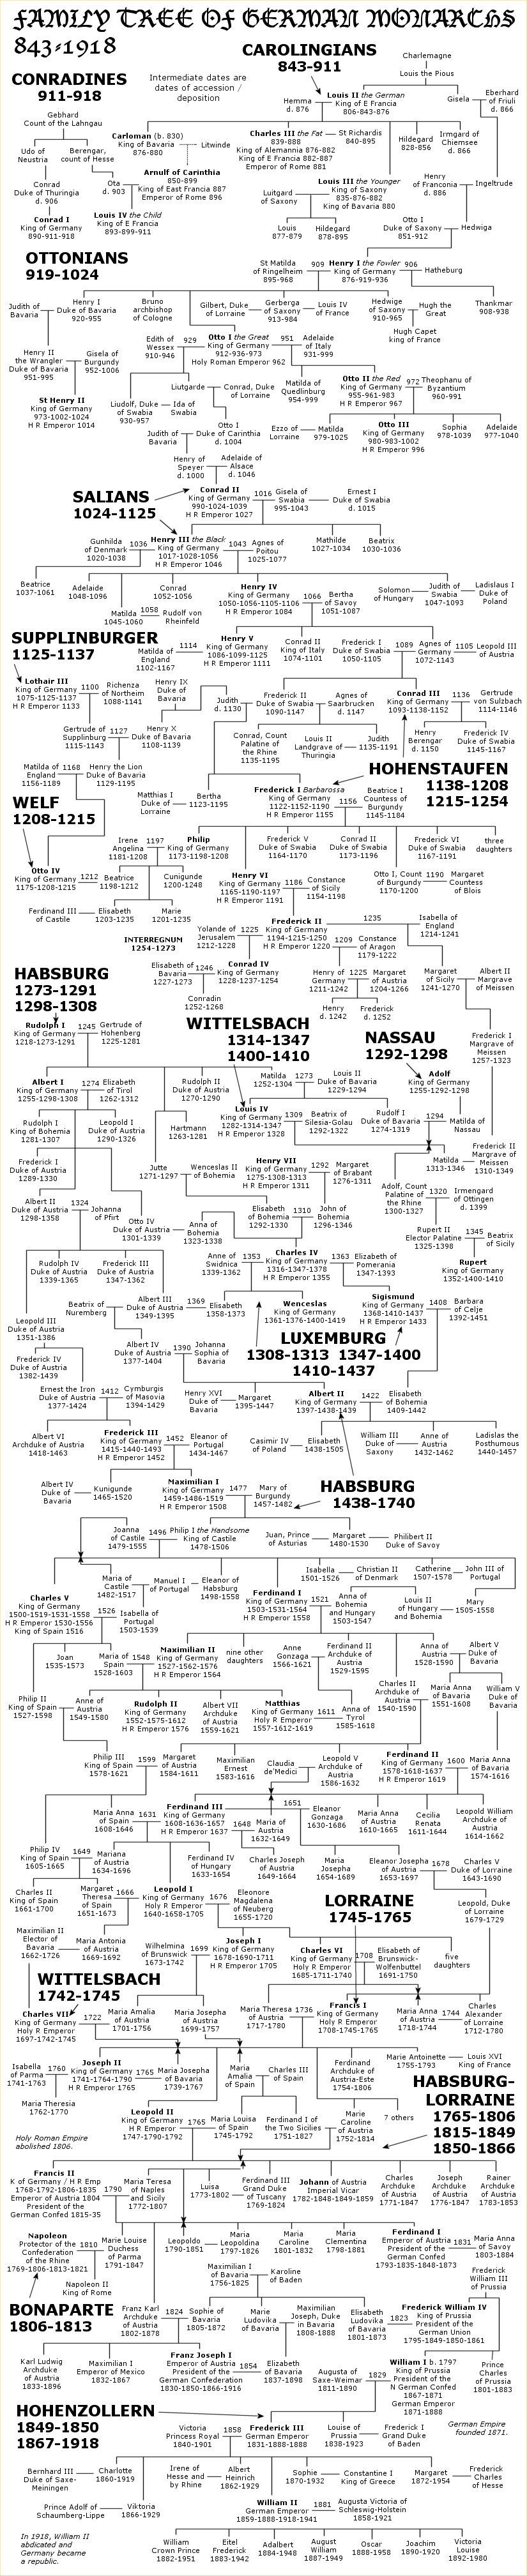 German monarchs family tree